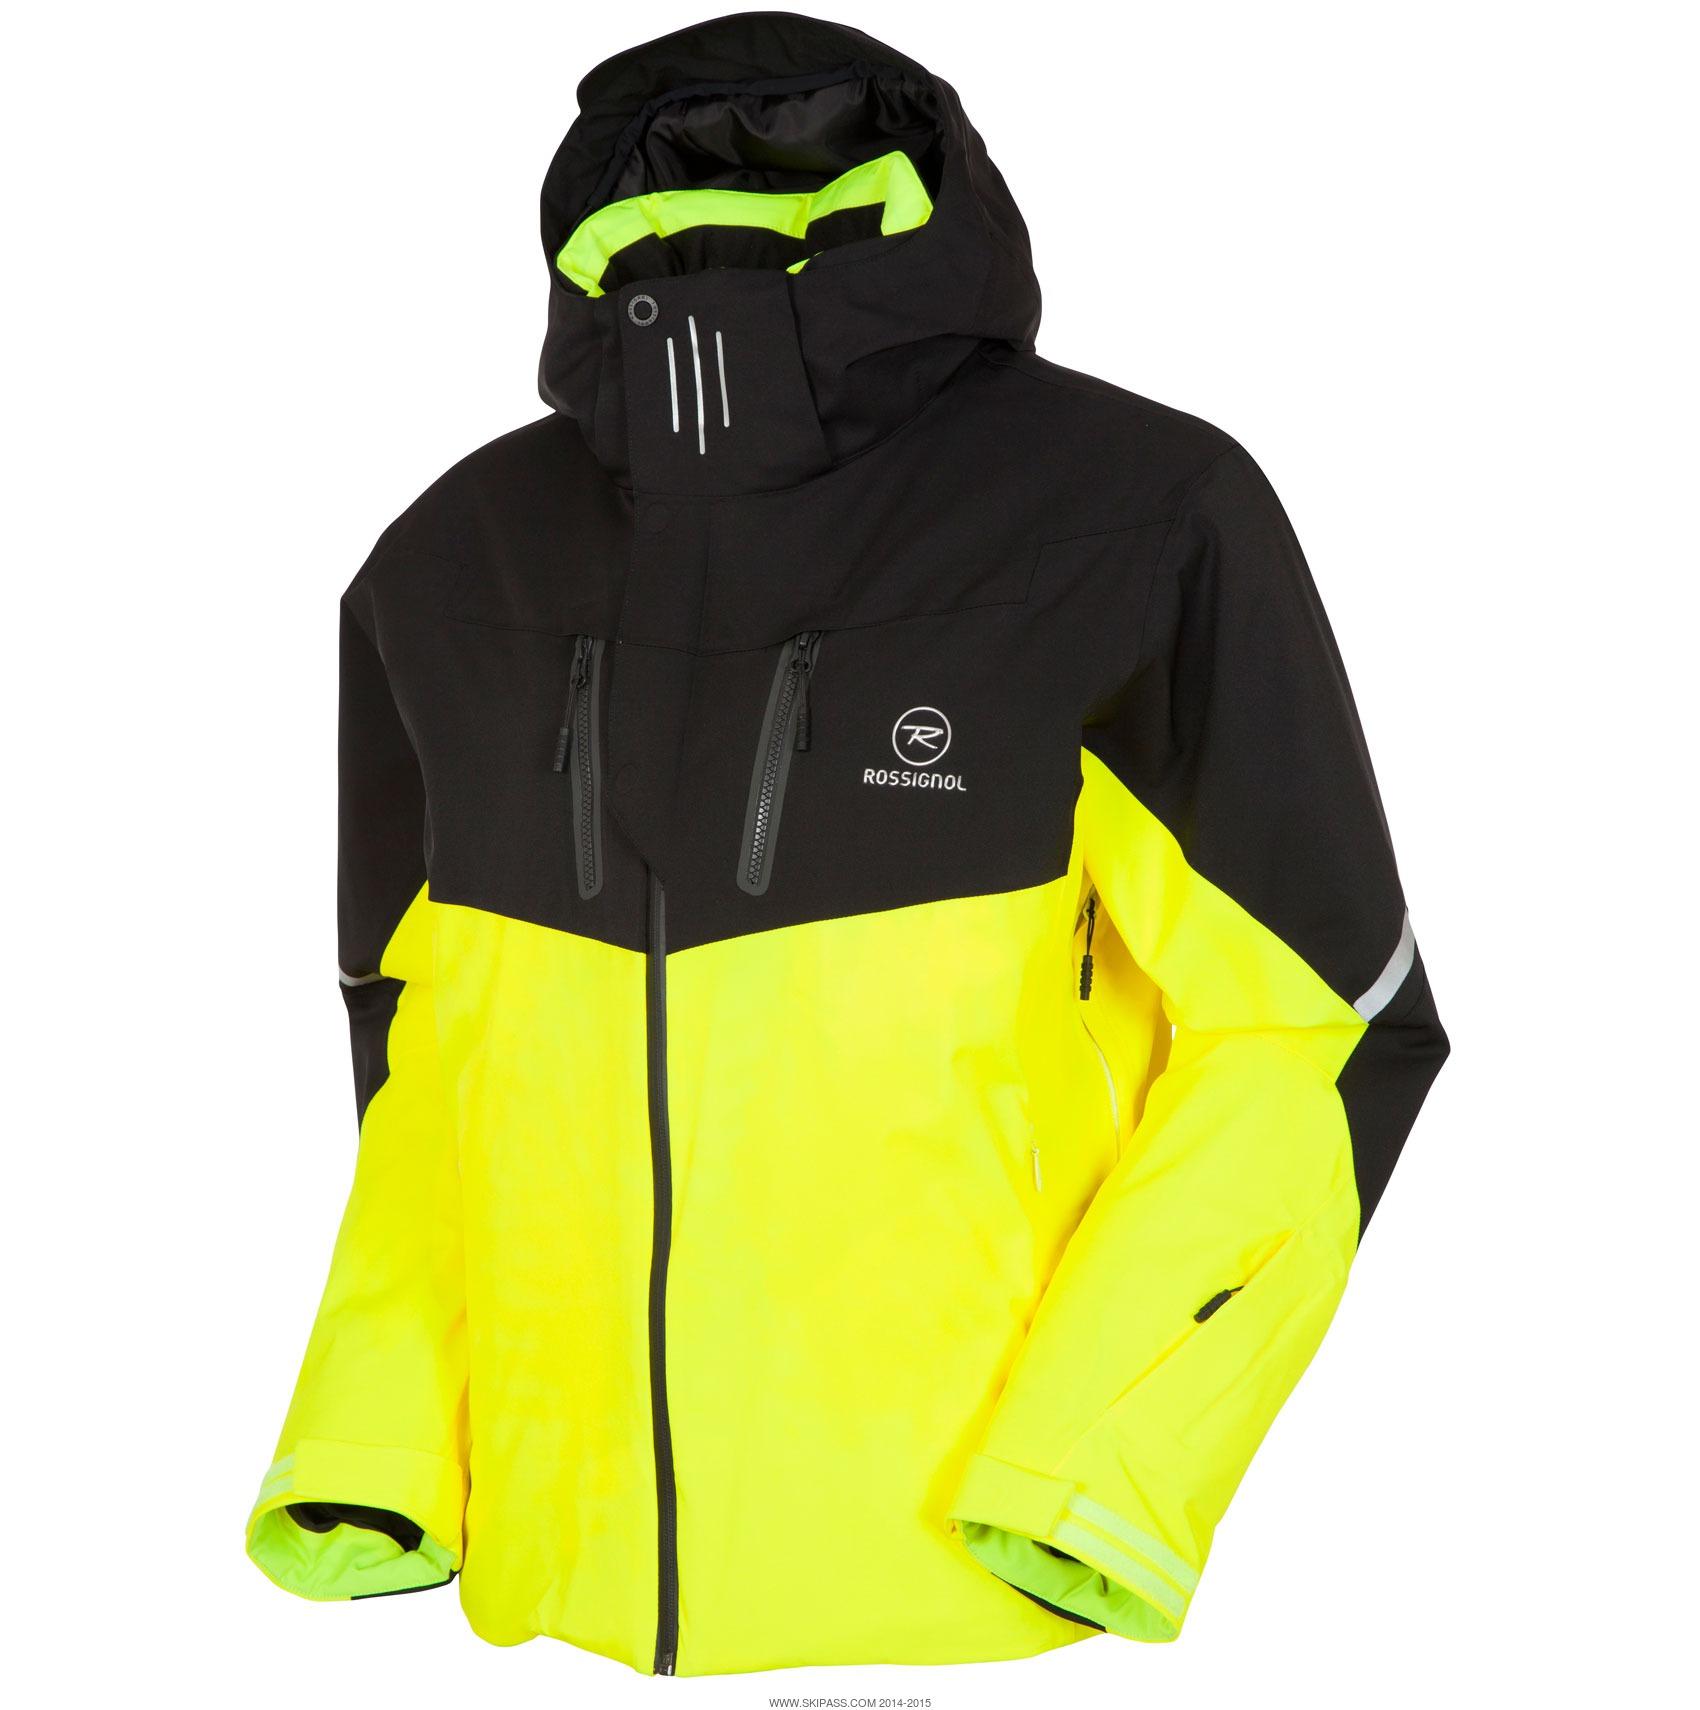 Veste de ski homme fluo